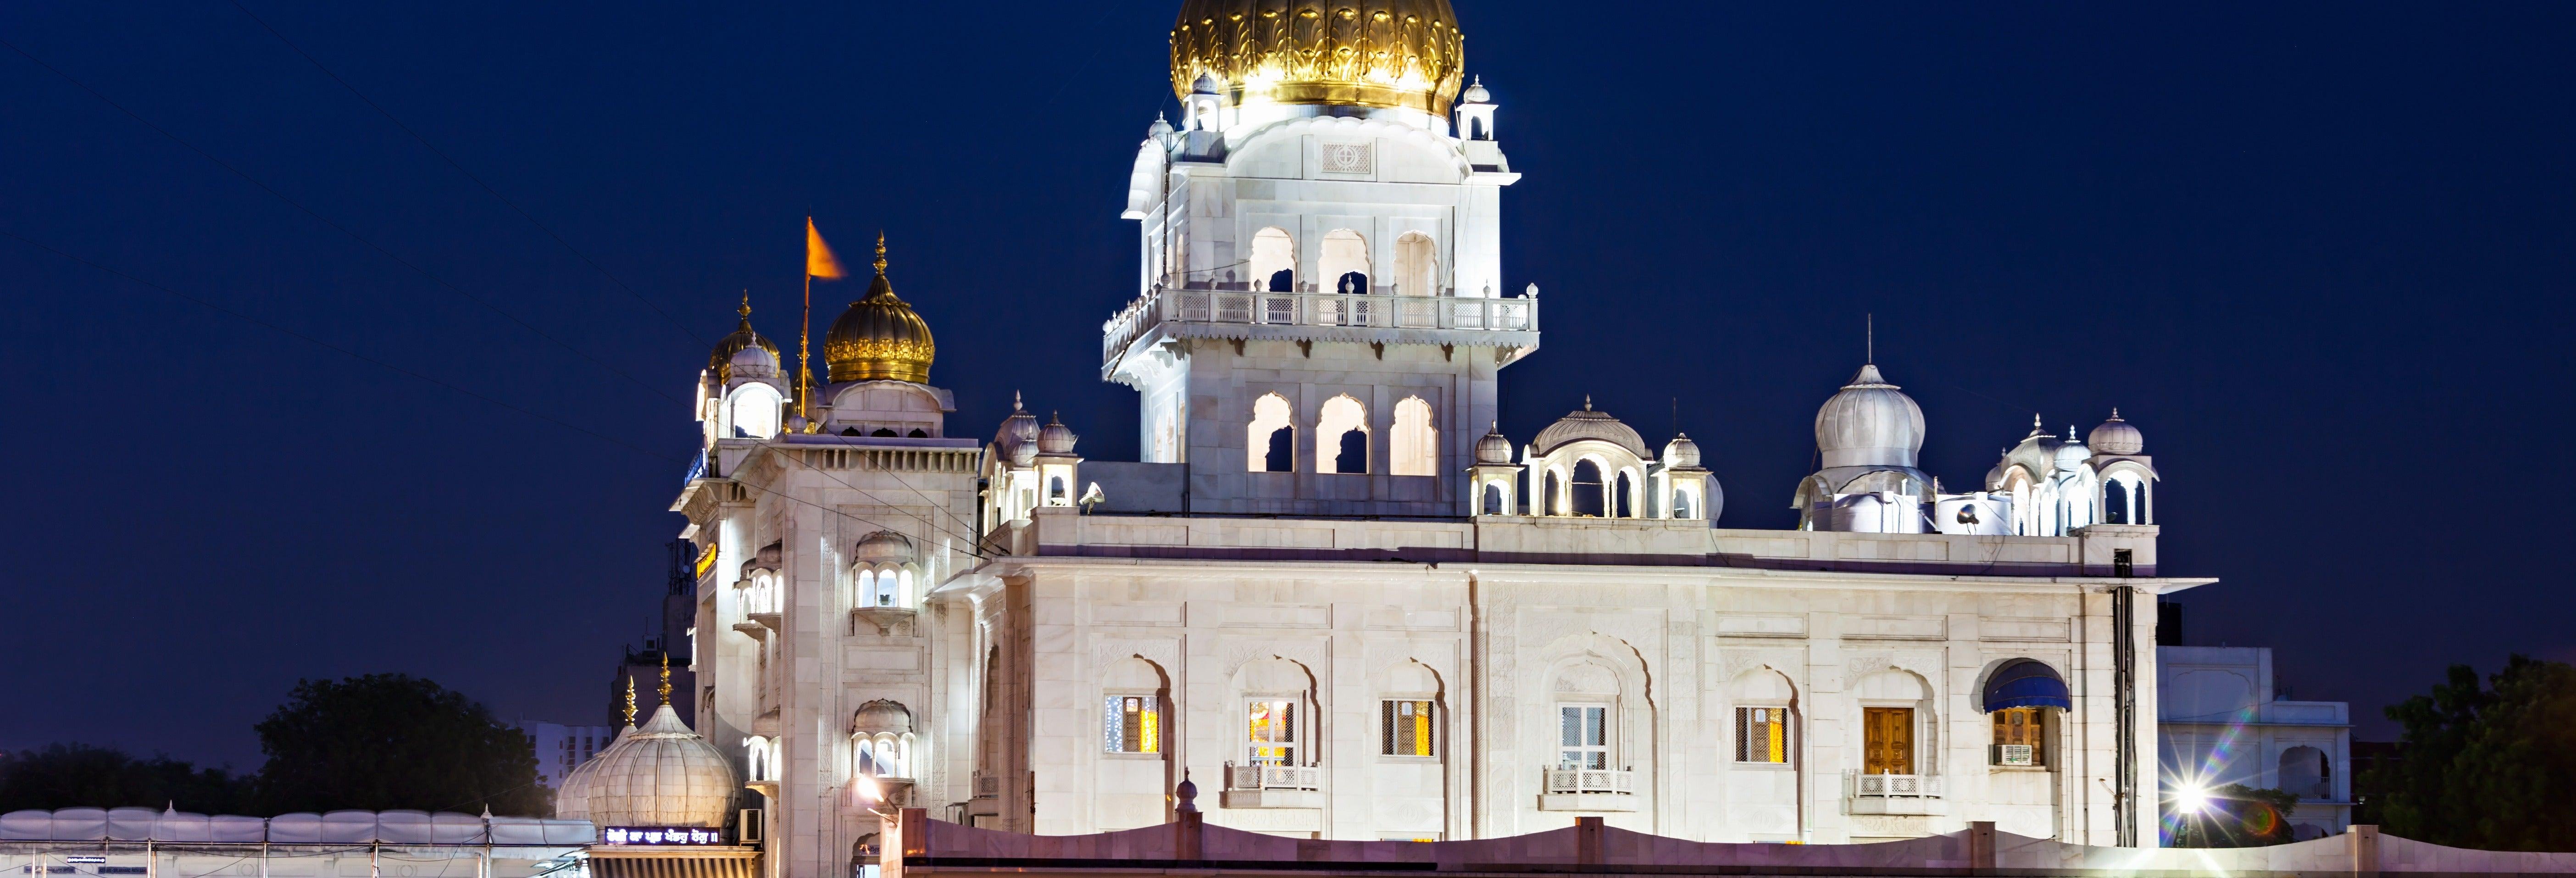 Visite nocturne dans Delhi